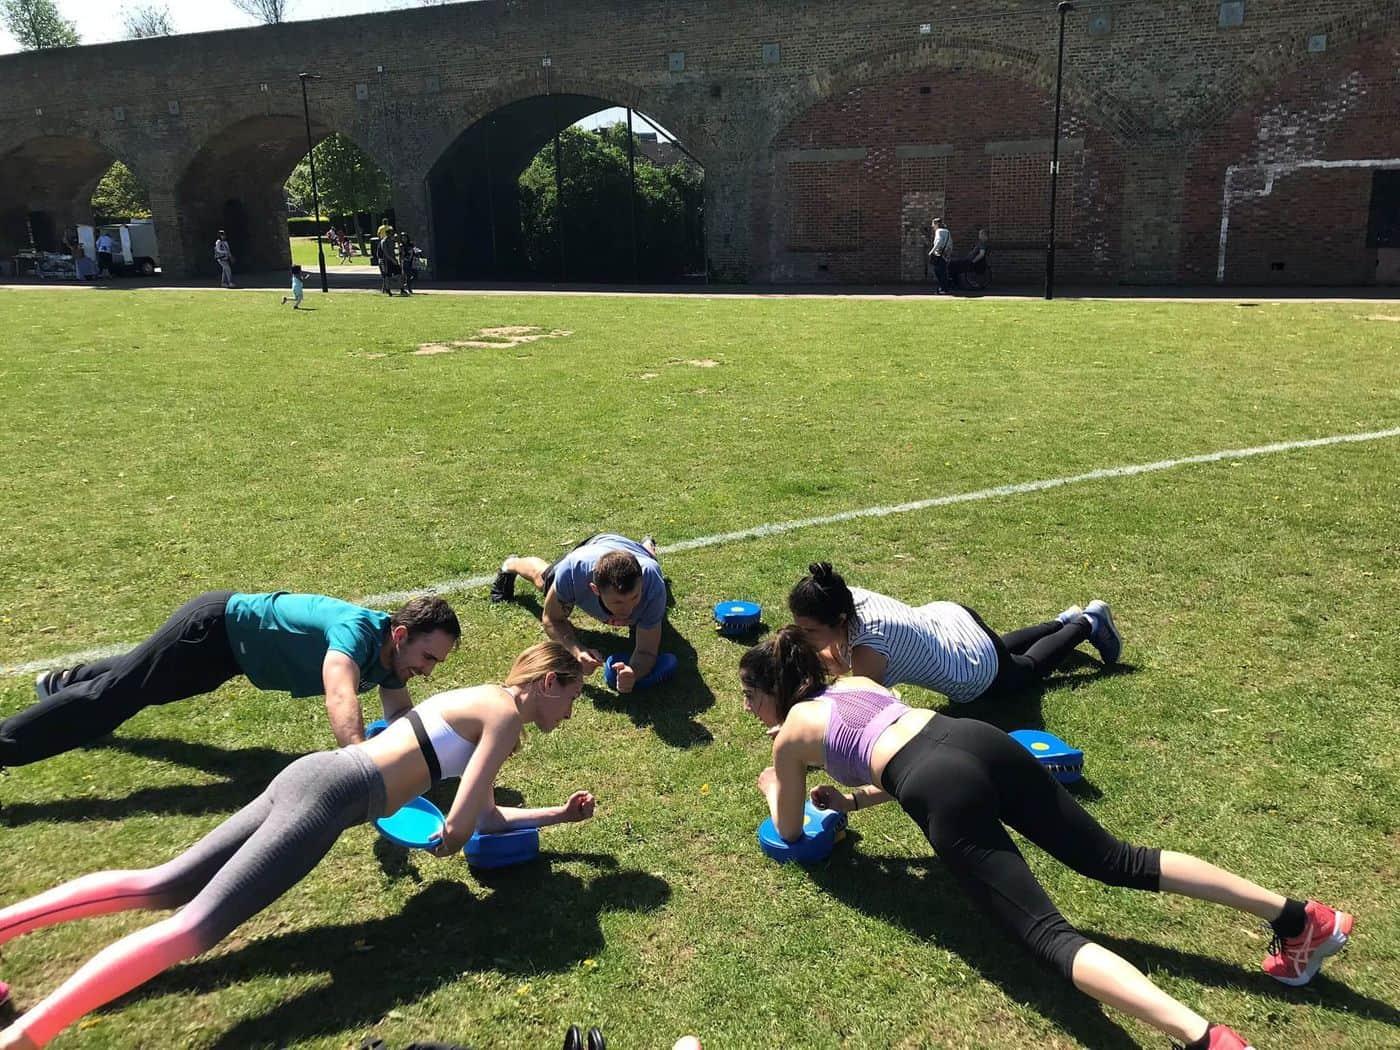 Freedom Yoga - Outdoor Yoga Class